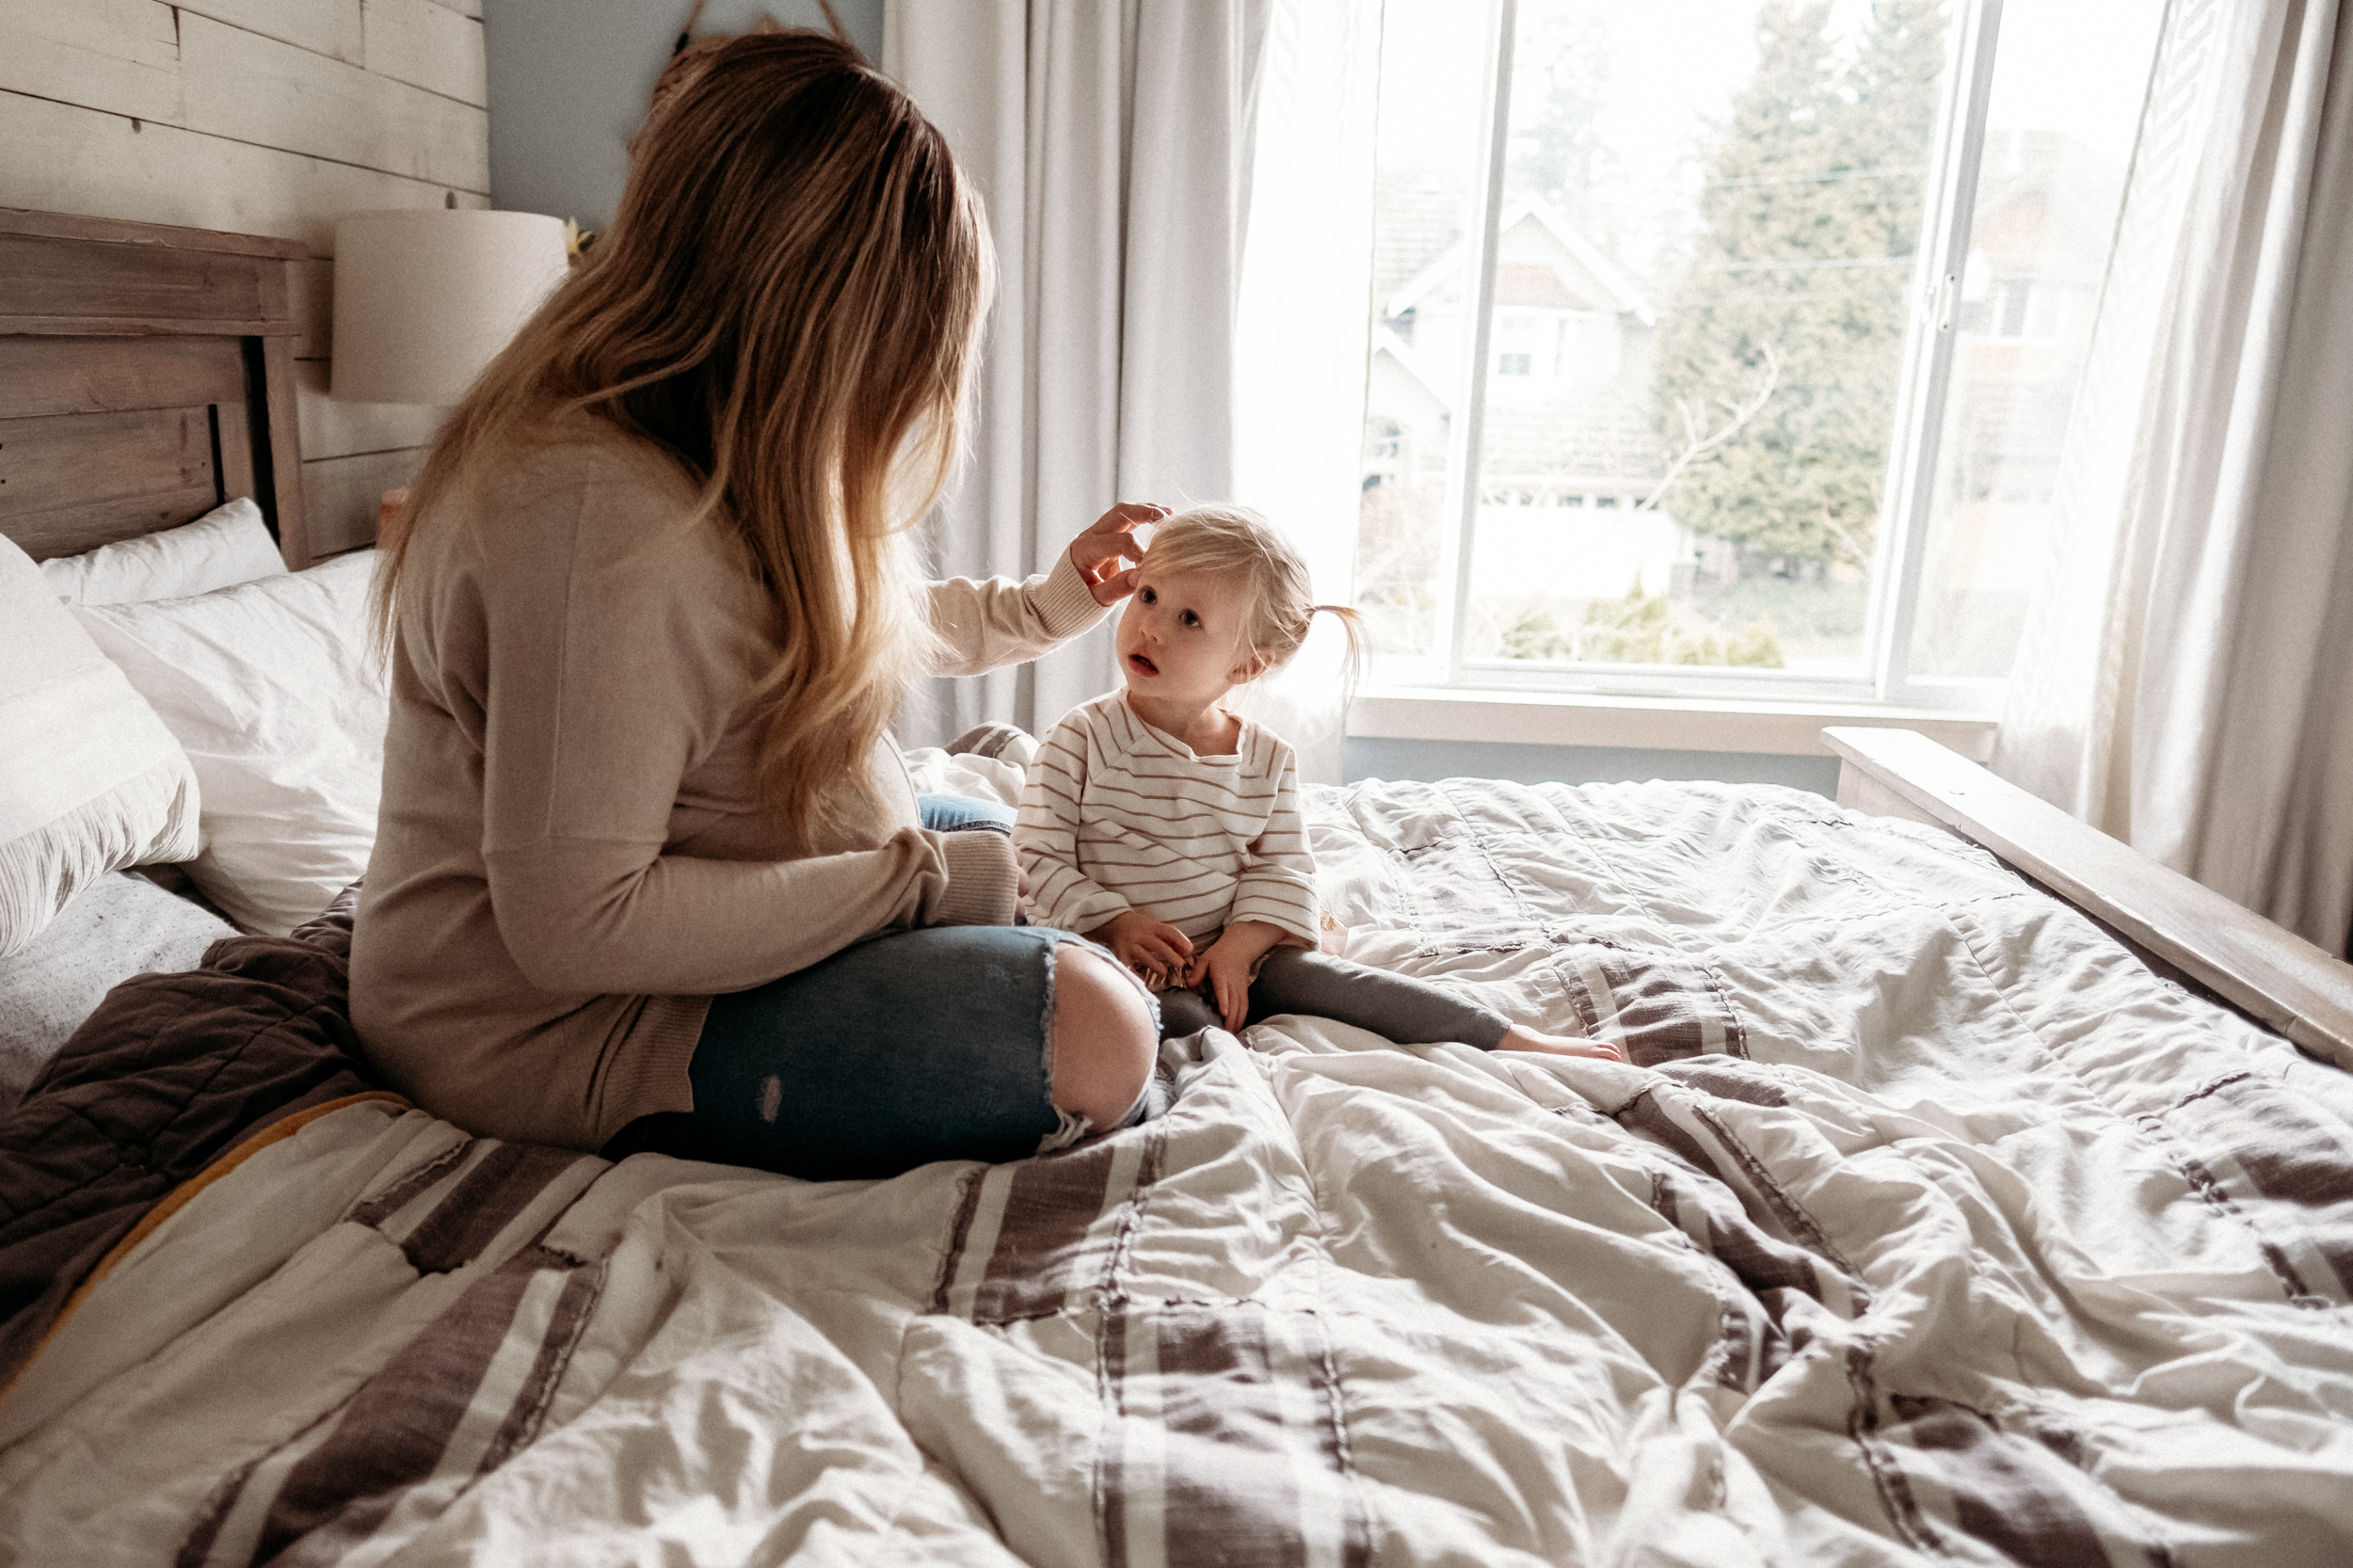 toddler-mom-bed-pregnant.jpg